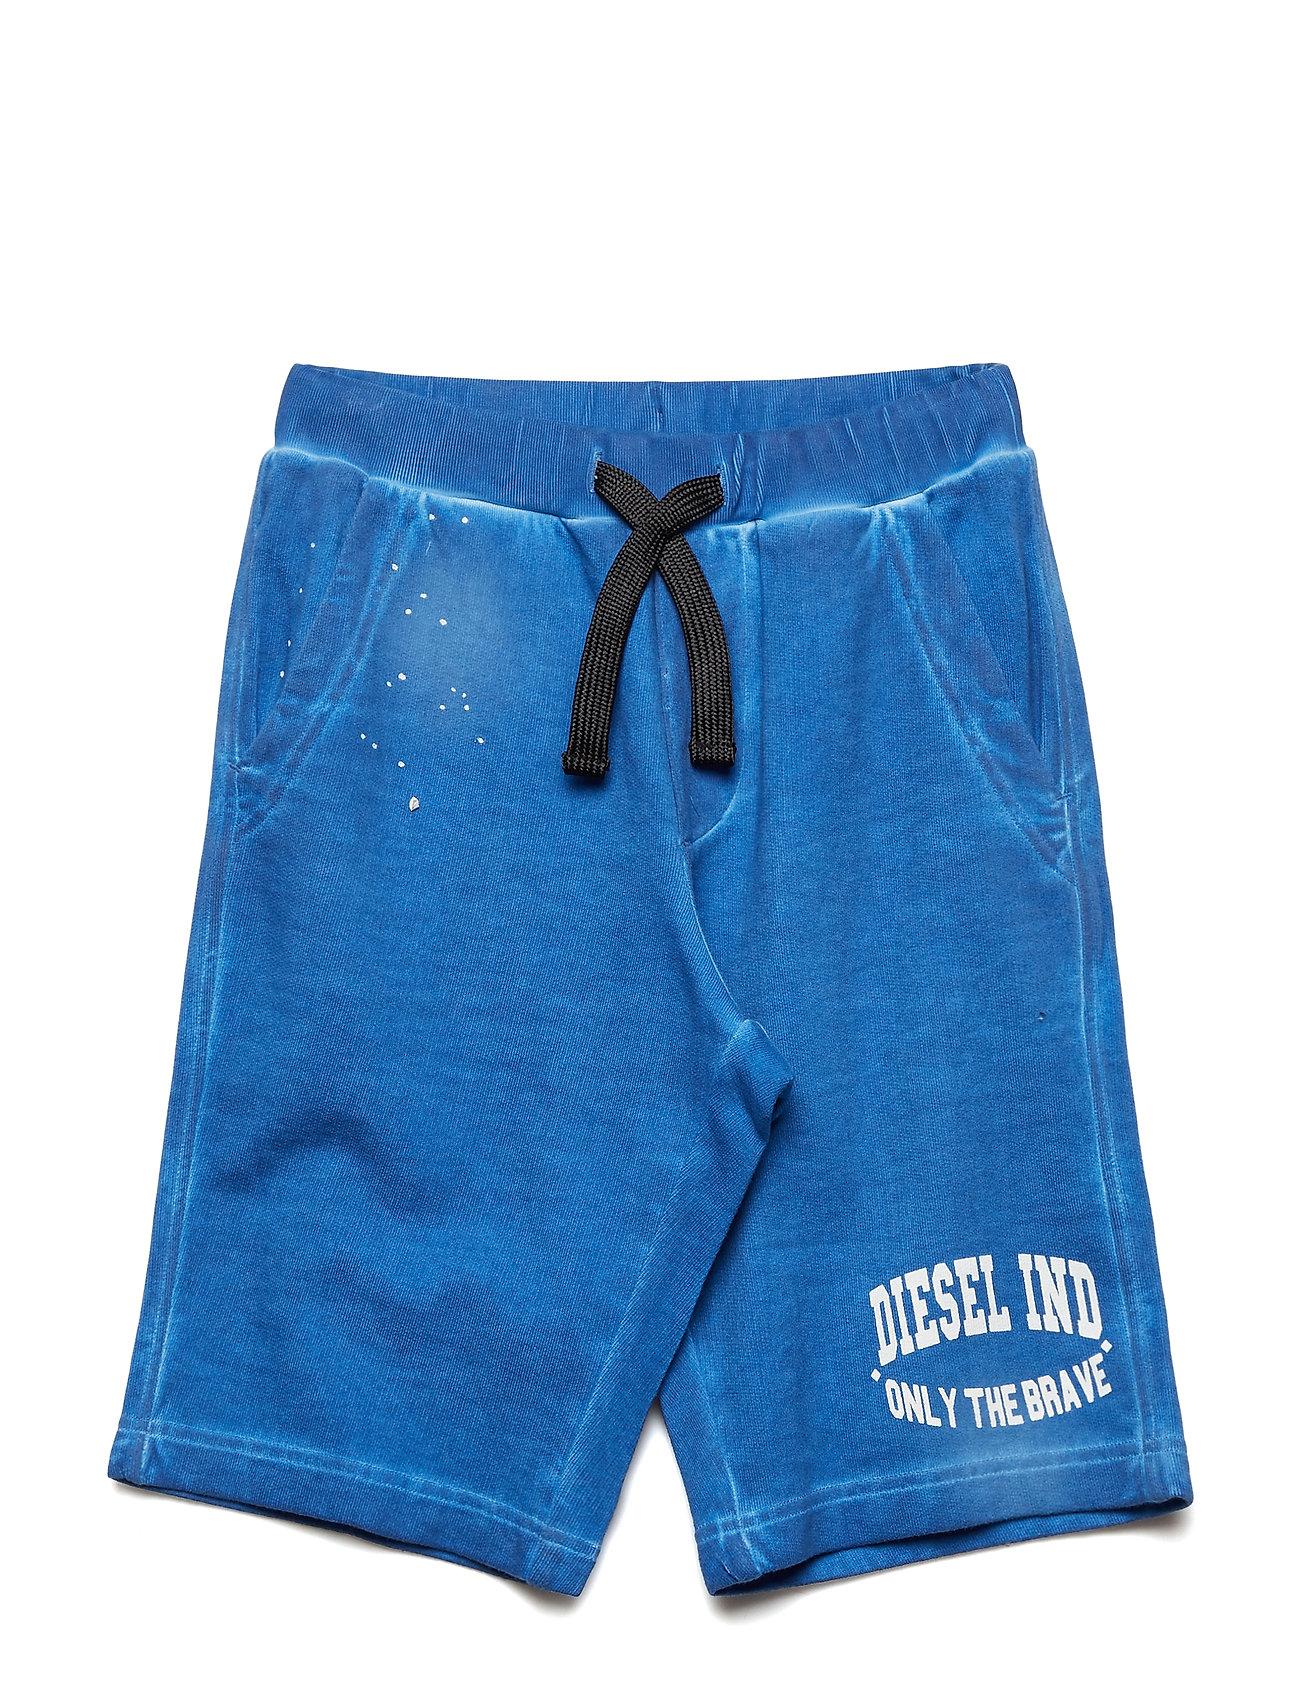 Pillor Shorts - Diesel